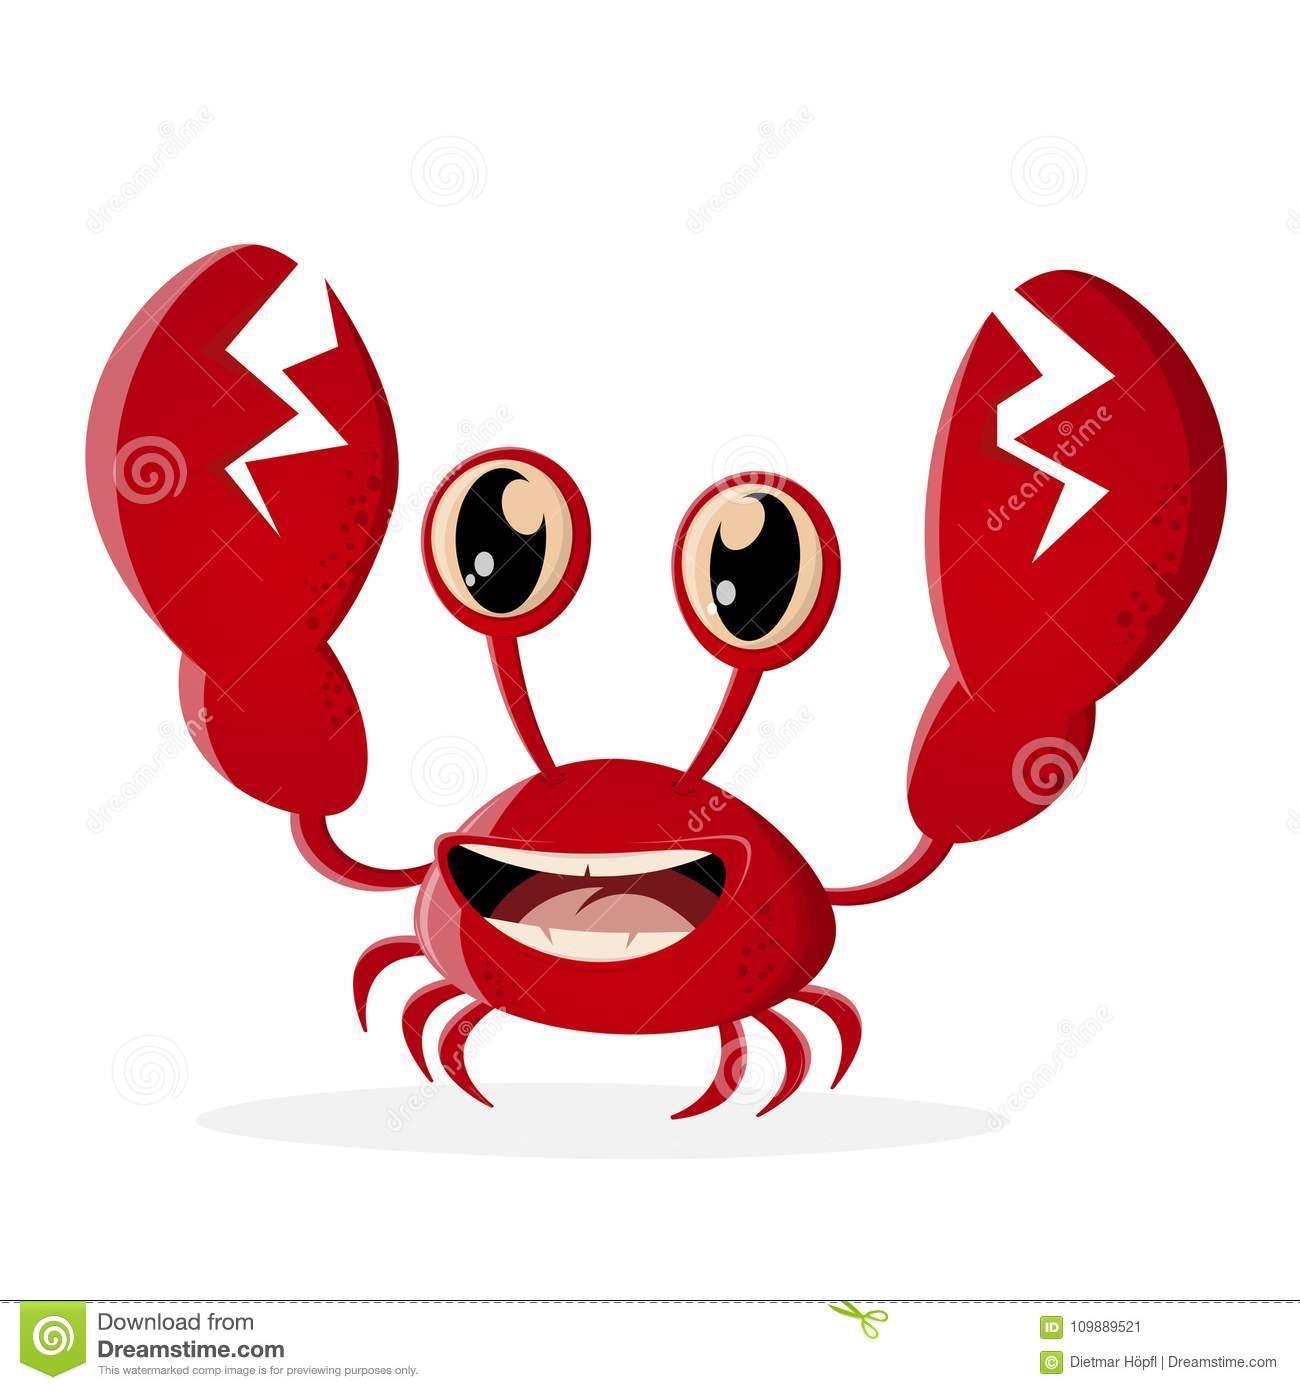 Funny crab clipart stock vector. Illustration of retro.